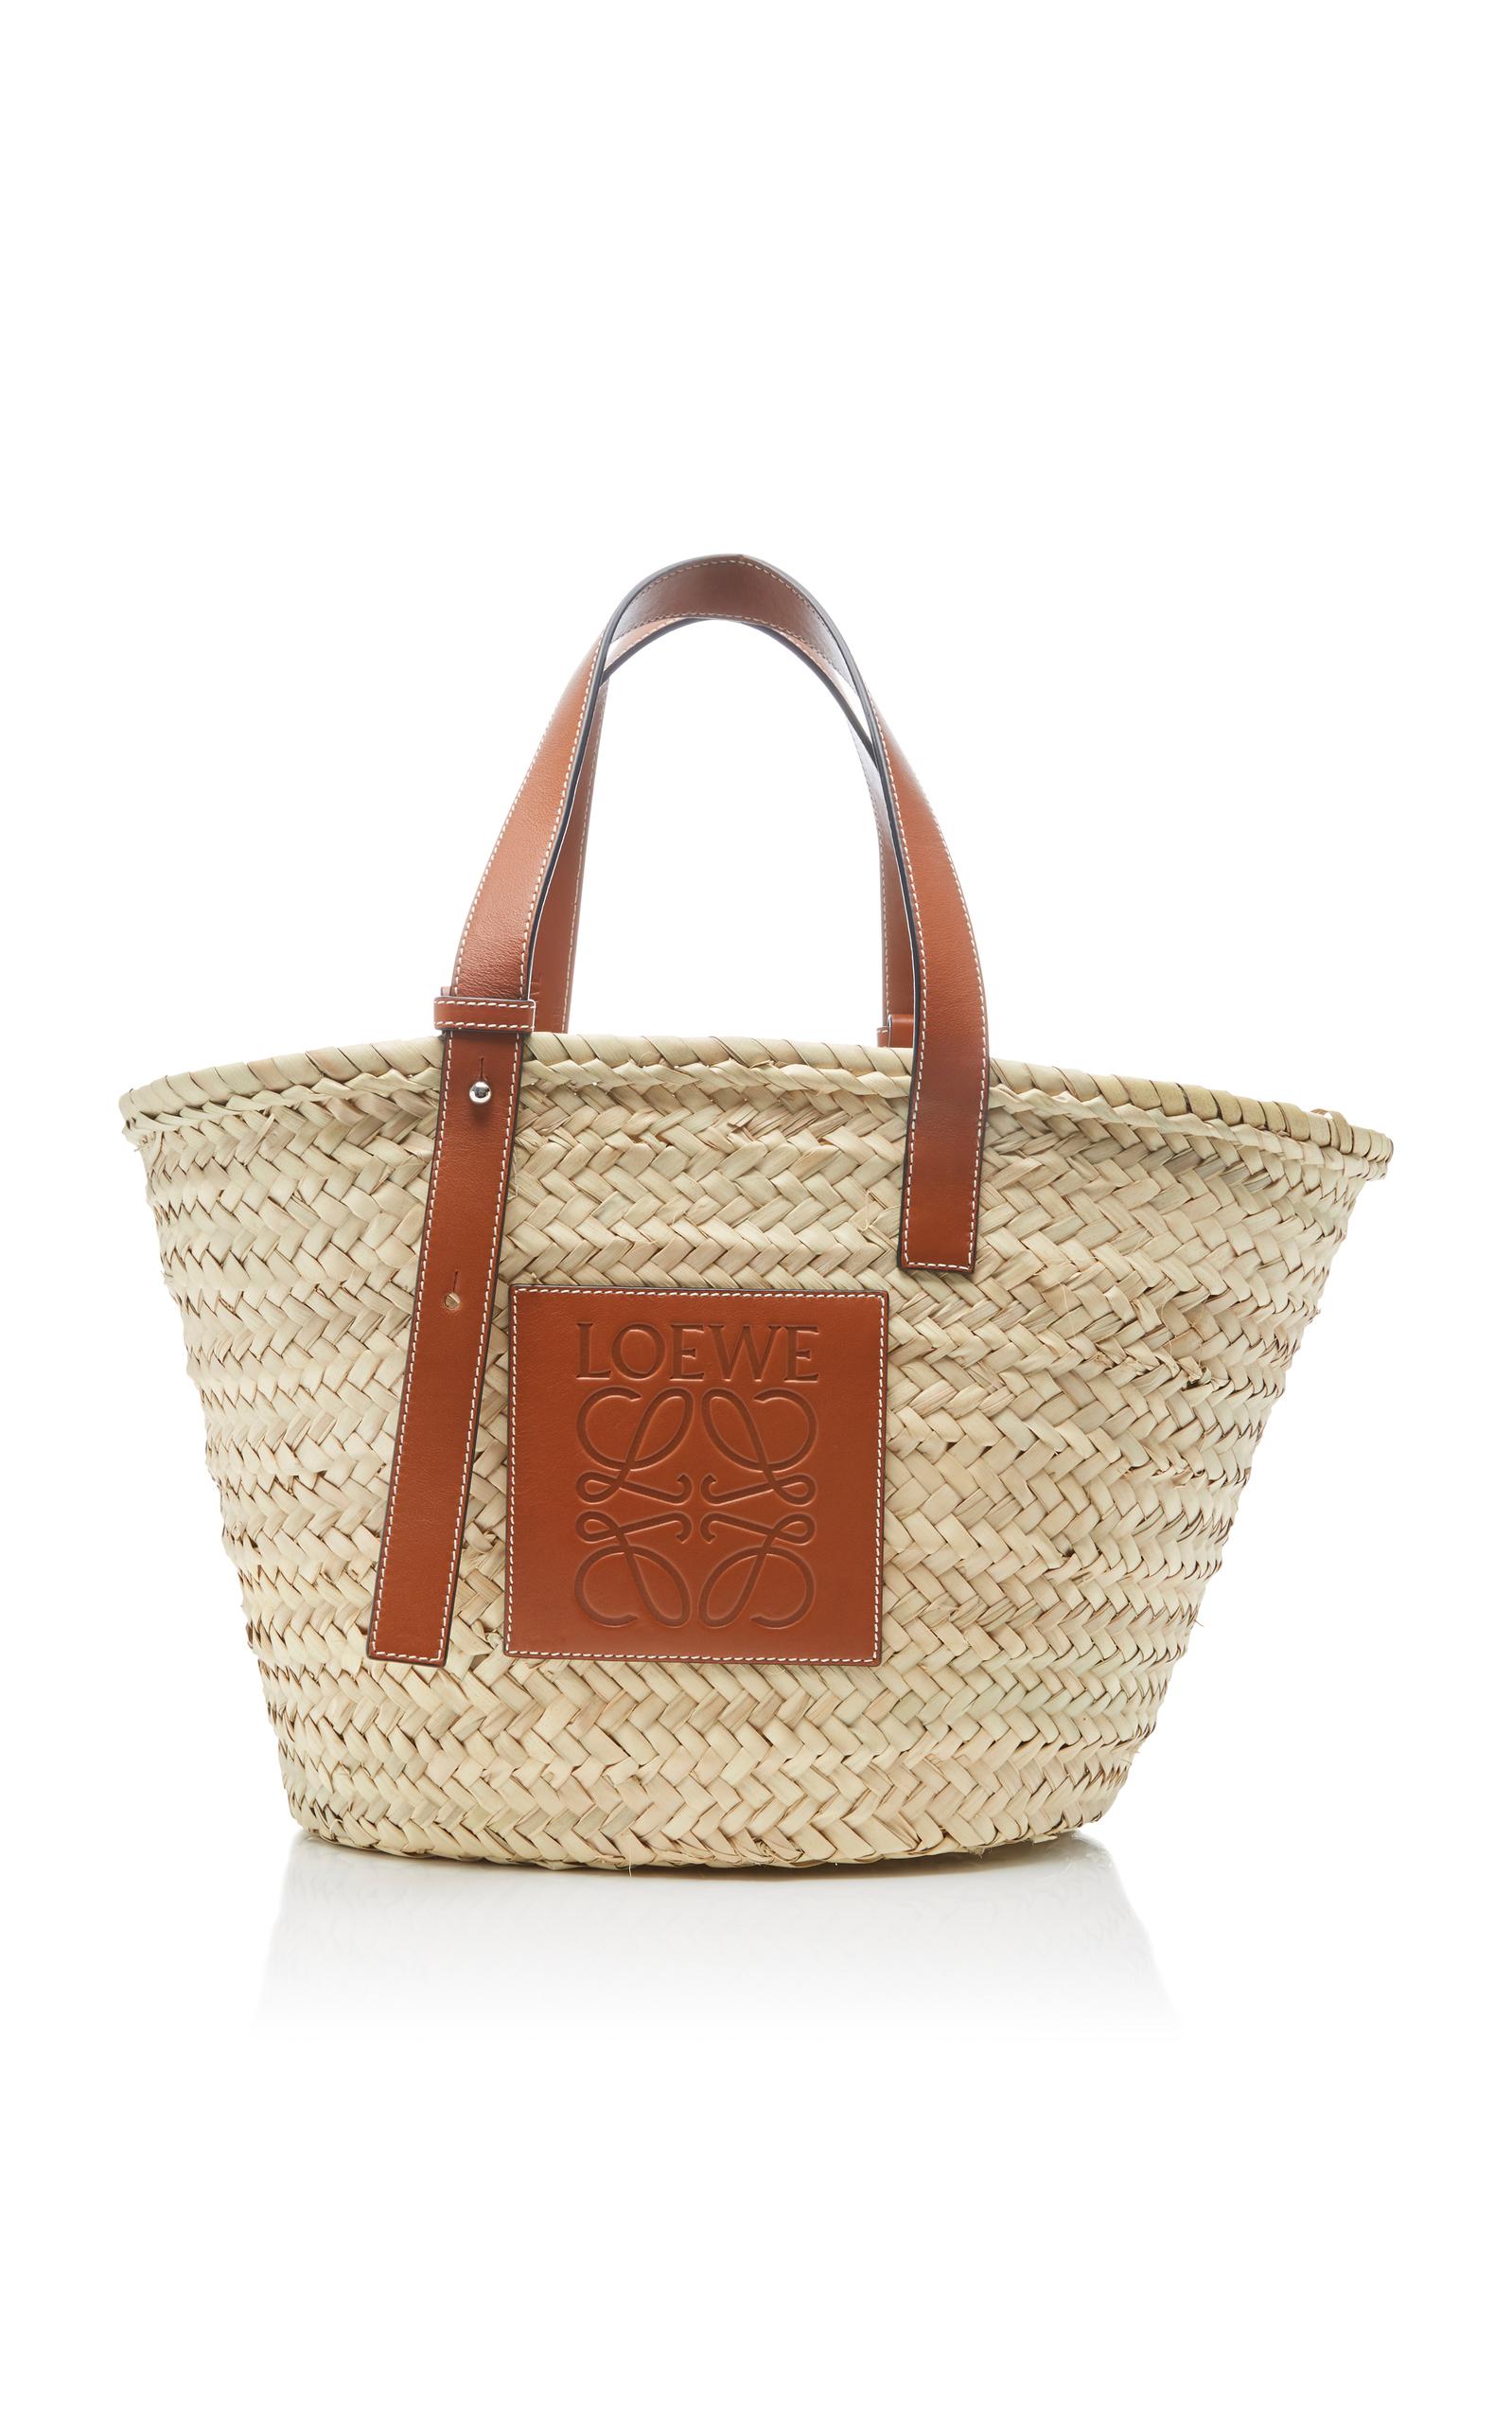 7add2f44948 Leather-Trimmed Woven Raffia Medium Basket Bag by Loewe   Moda Operandi